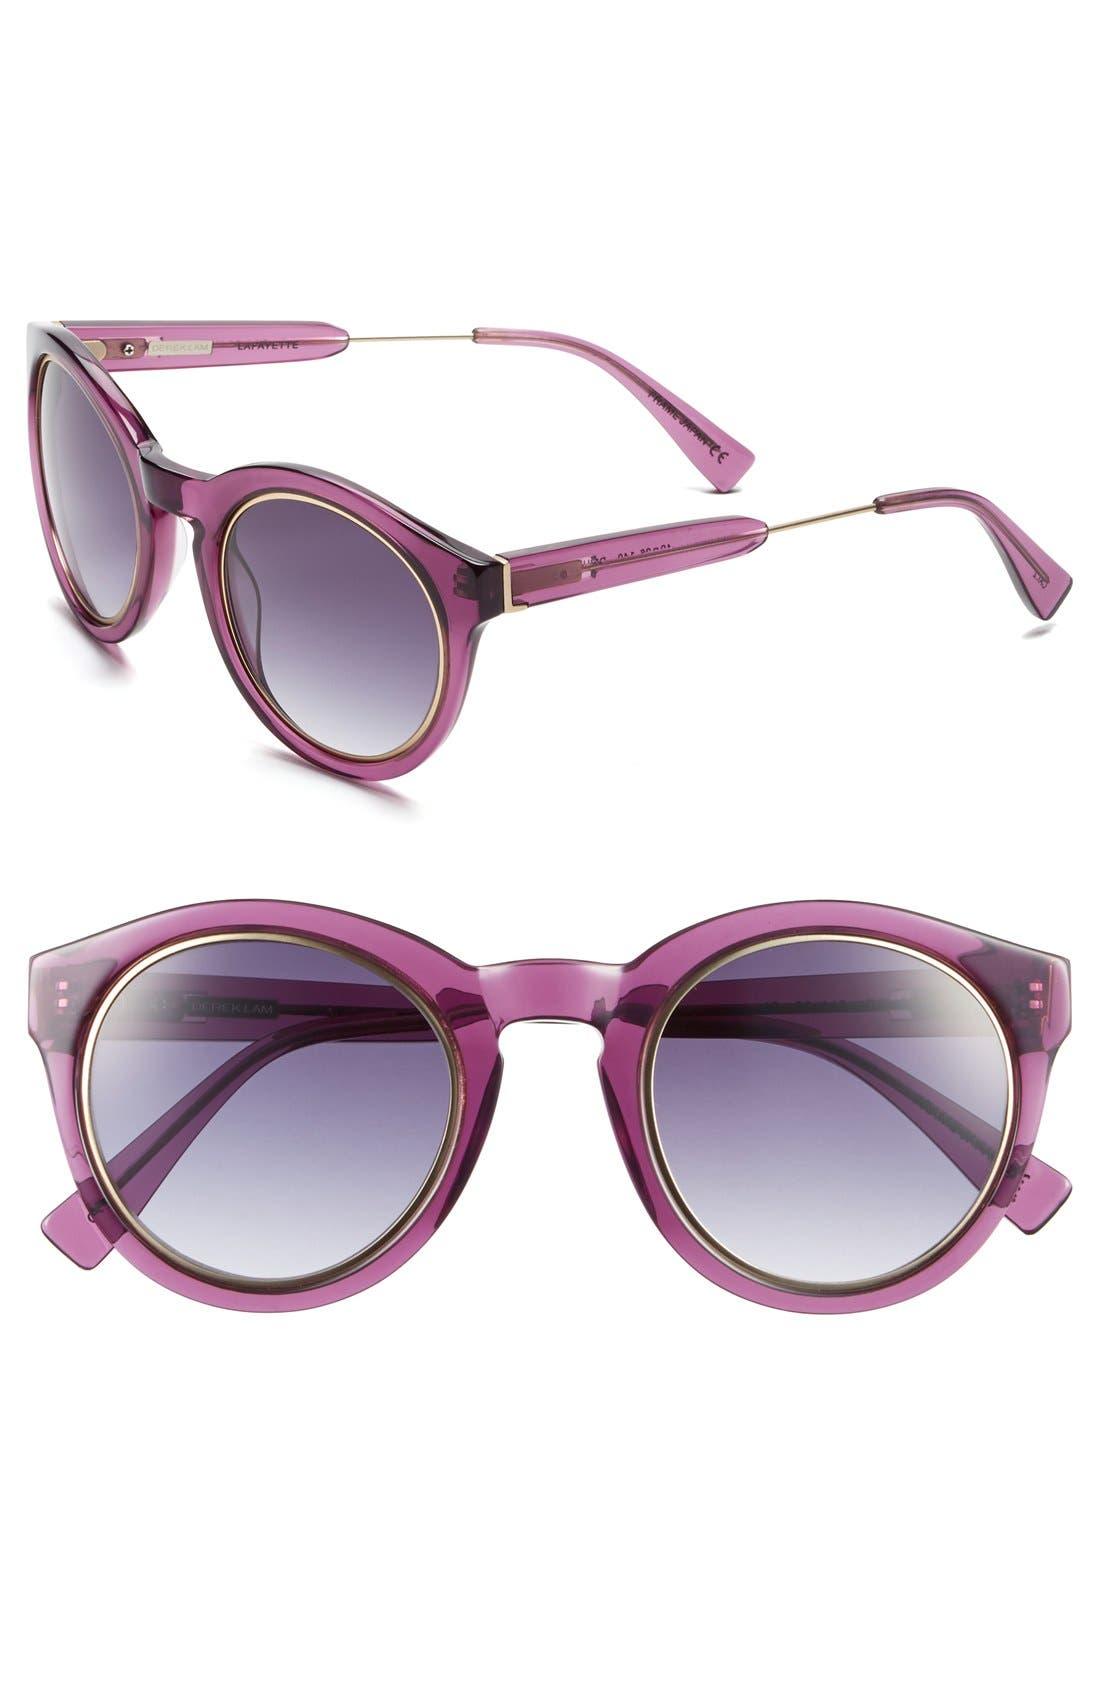 Alternate Image 1 Selected - Derek Lam 'Lafayette' 49mm Sunglasses